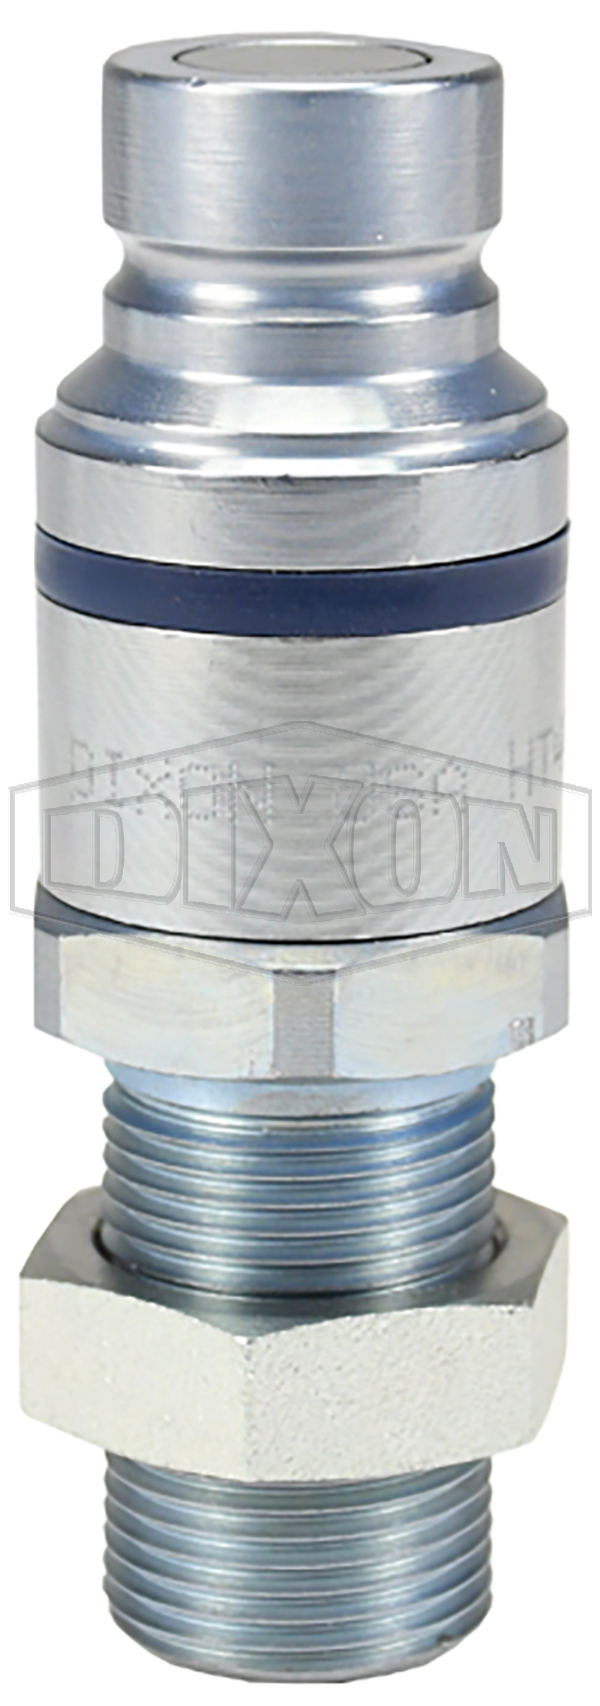 DQC HT-Series Correct Connect® Flushface Male Threaded Bulkhead Coupler